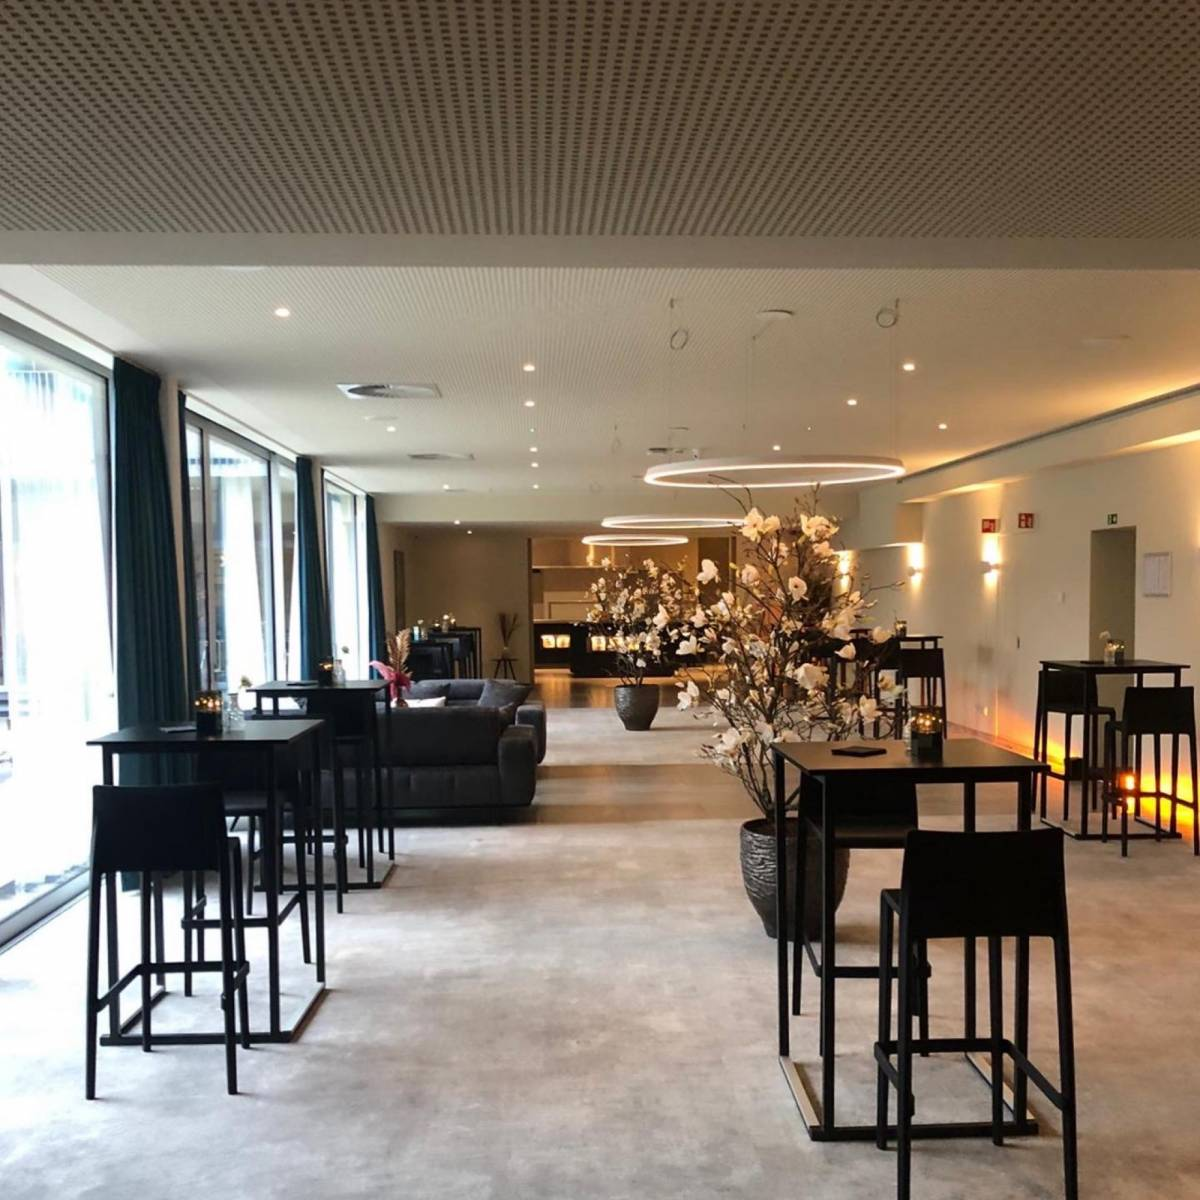 Feestal - Van der Valk hotel Mechelen - House of Weddings (22)